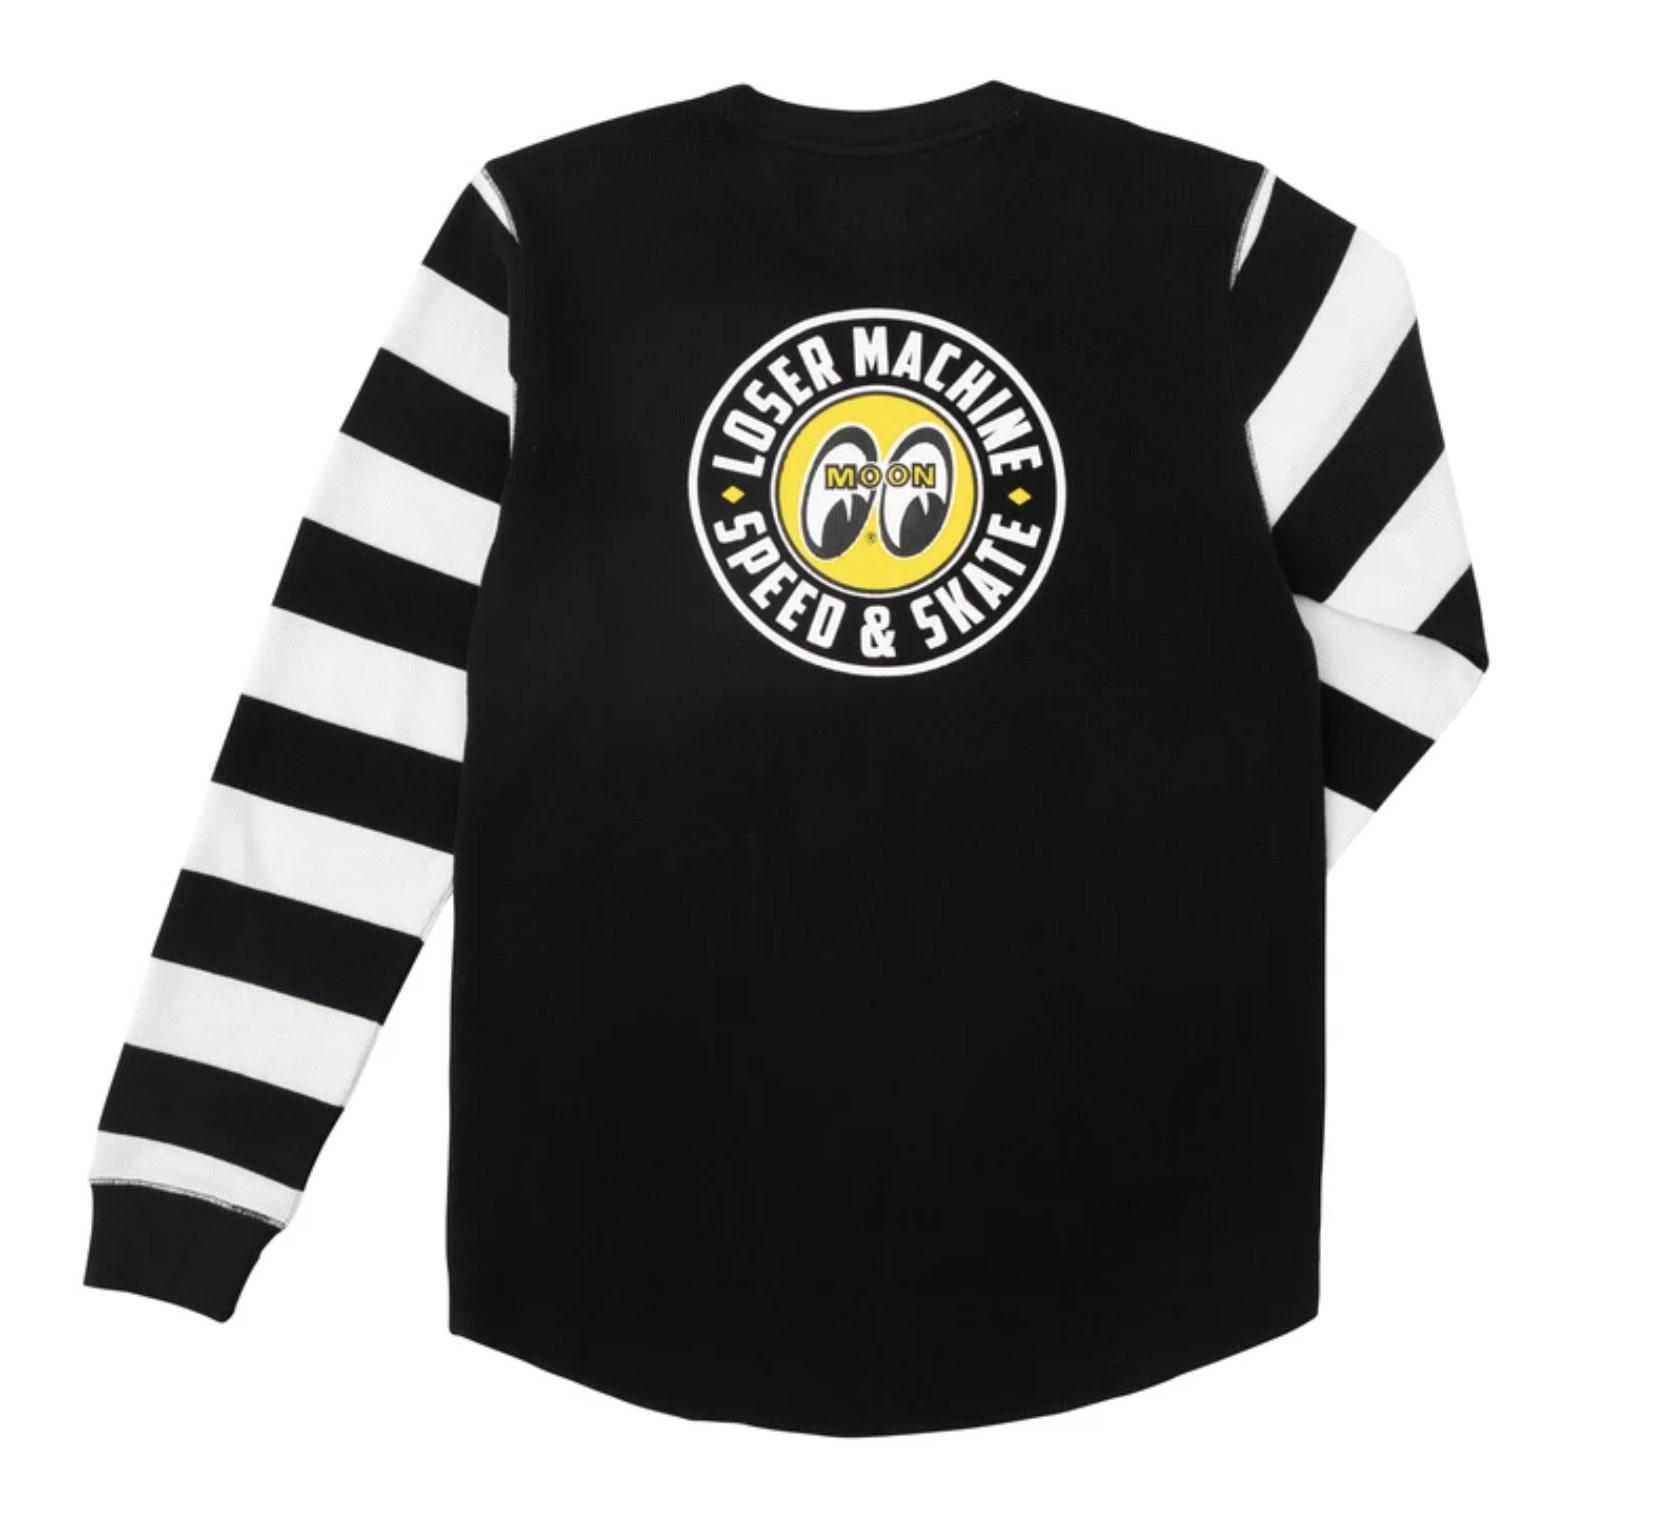 Loser Machine Loser Machine - Studebaker - Thermal Black White